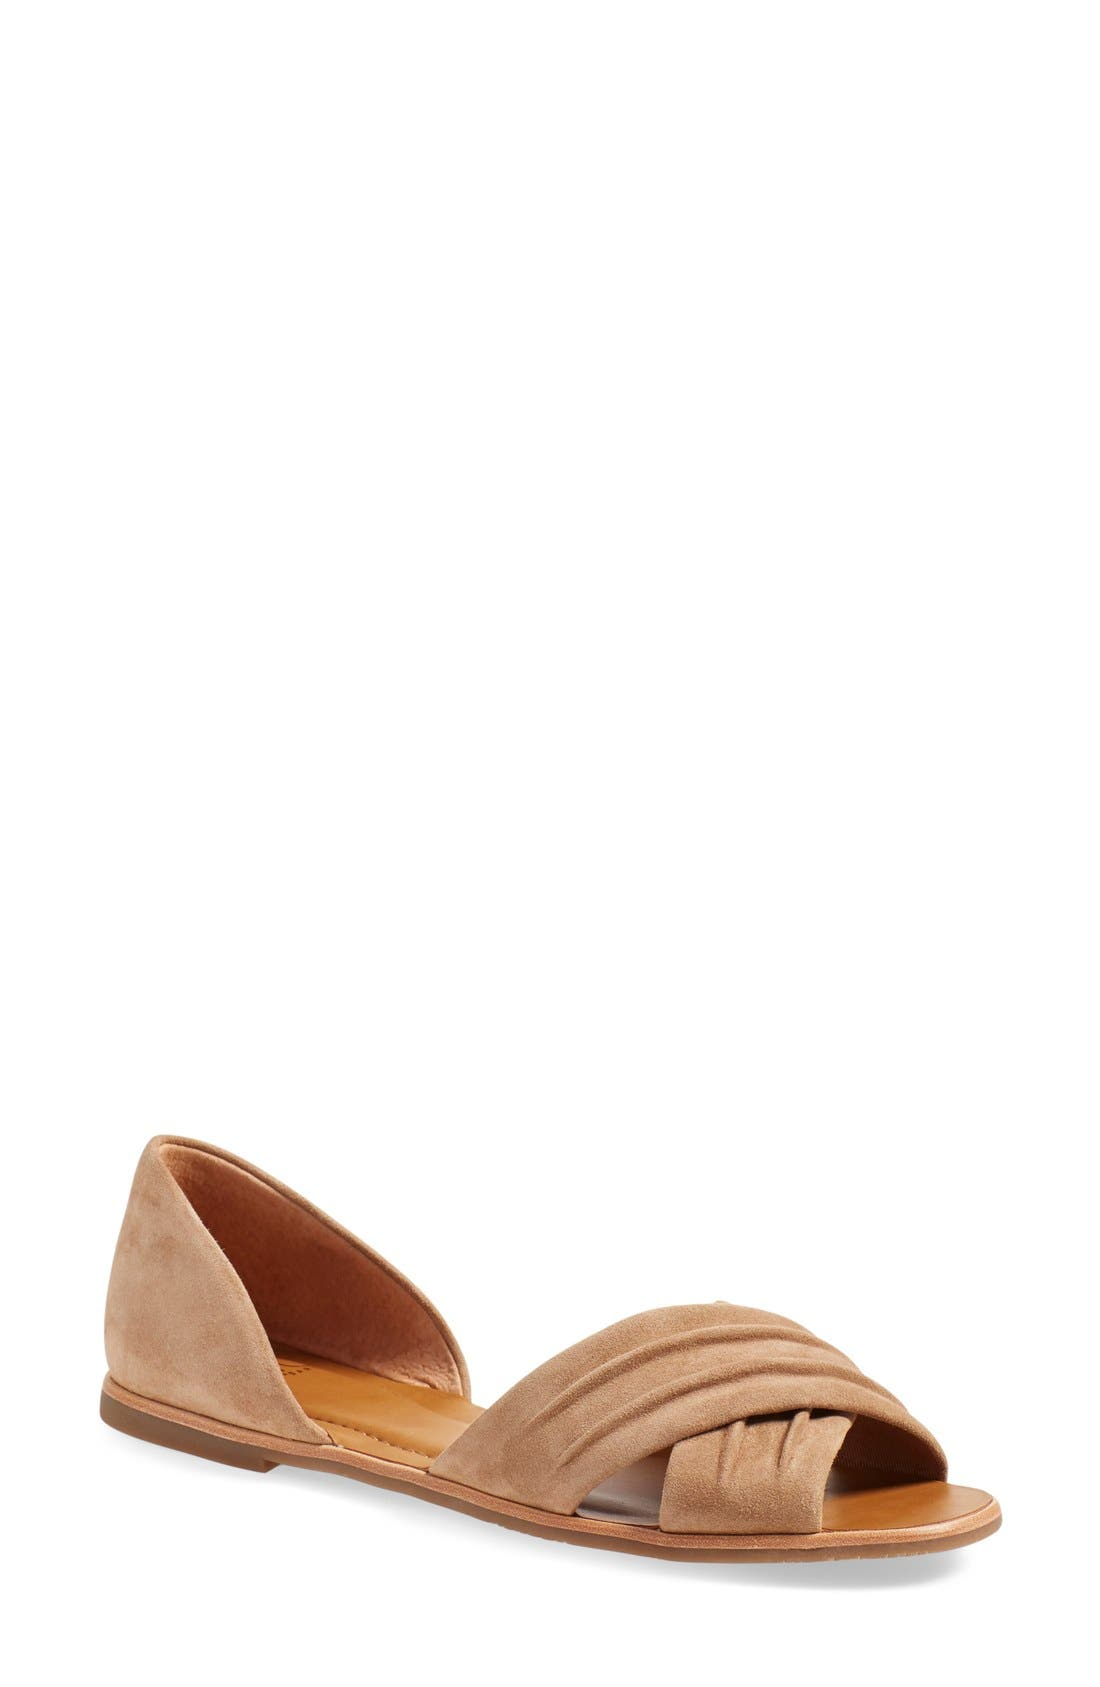 Alternate Image 1 Selected - SARTO by Franco Sarto 'Vala' Flat Sandal (Women)